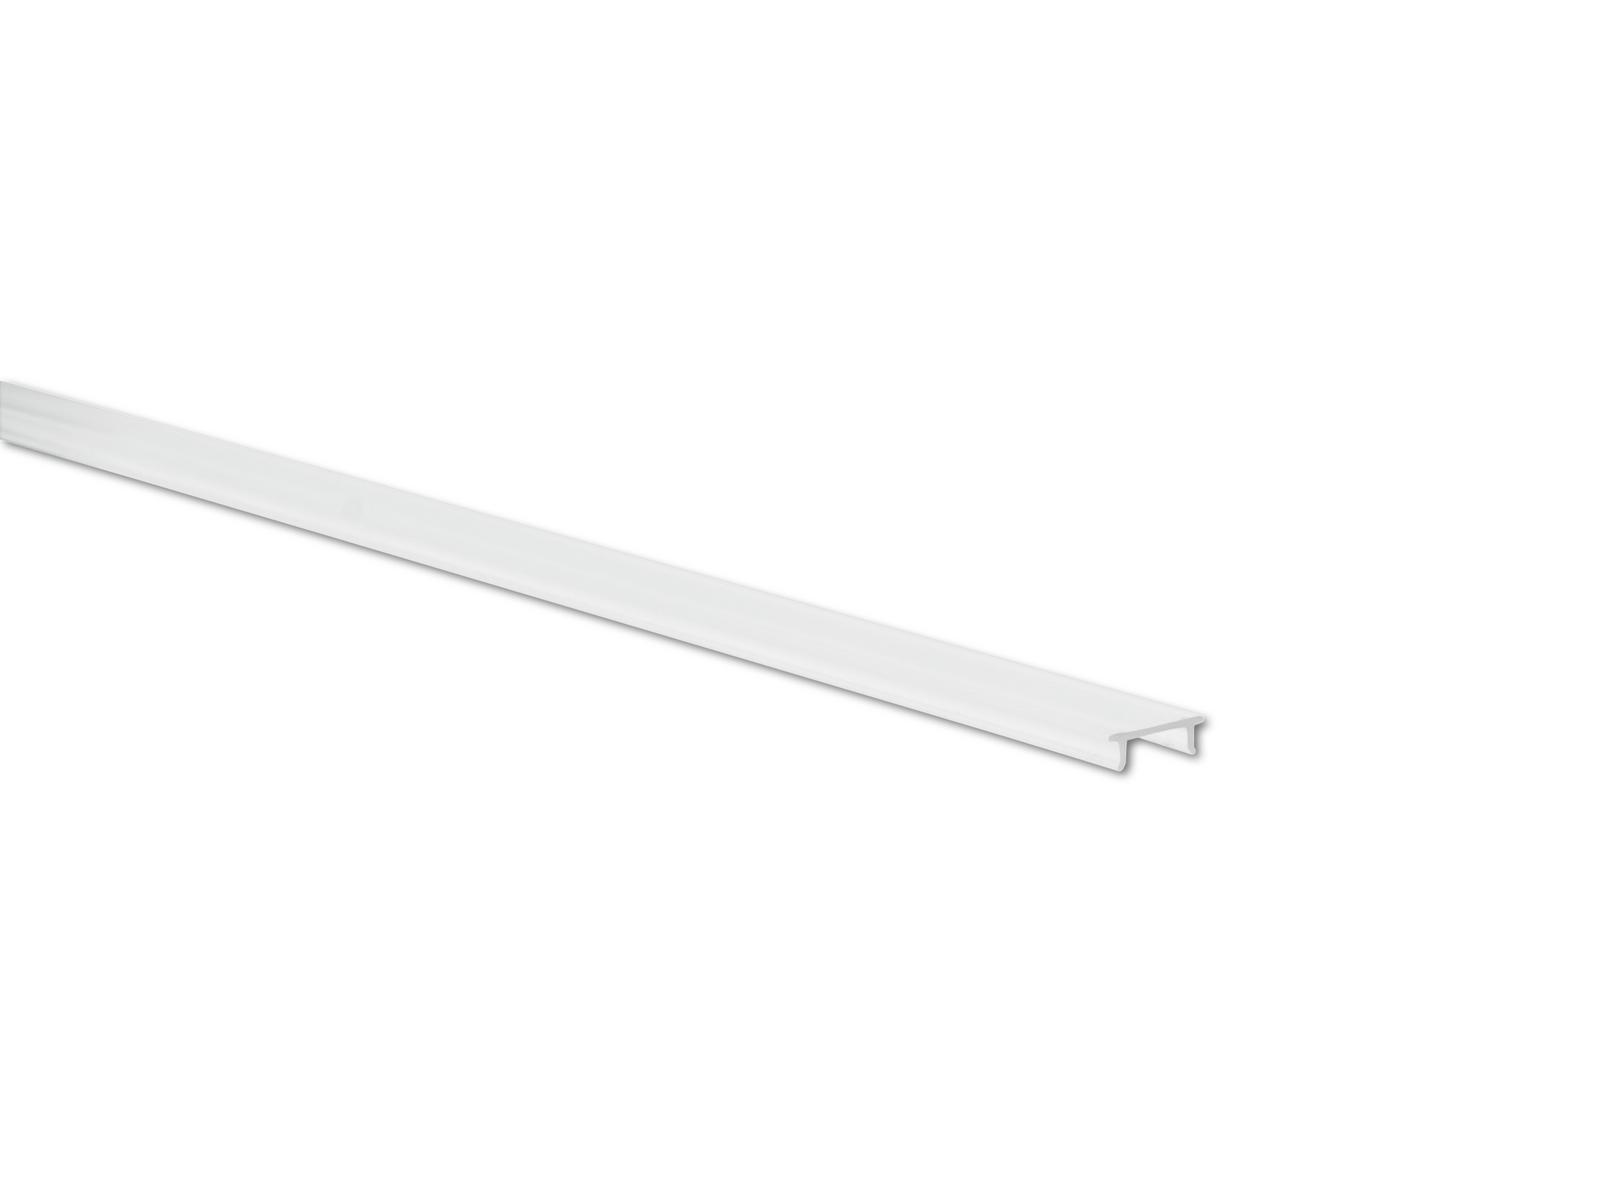 EUROLITE Deckel für LED Strip Profile clear 4m